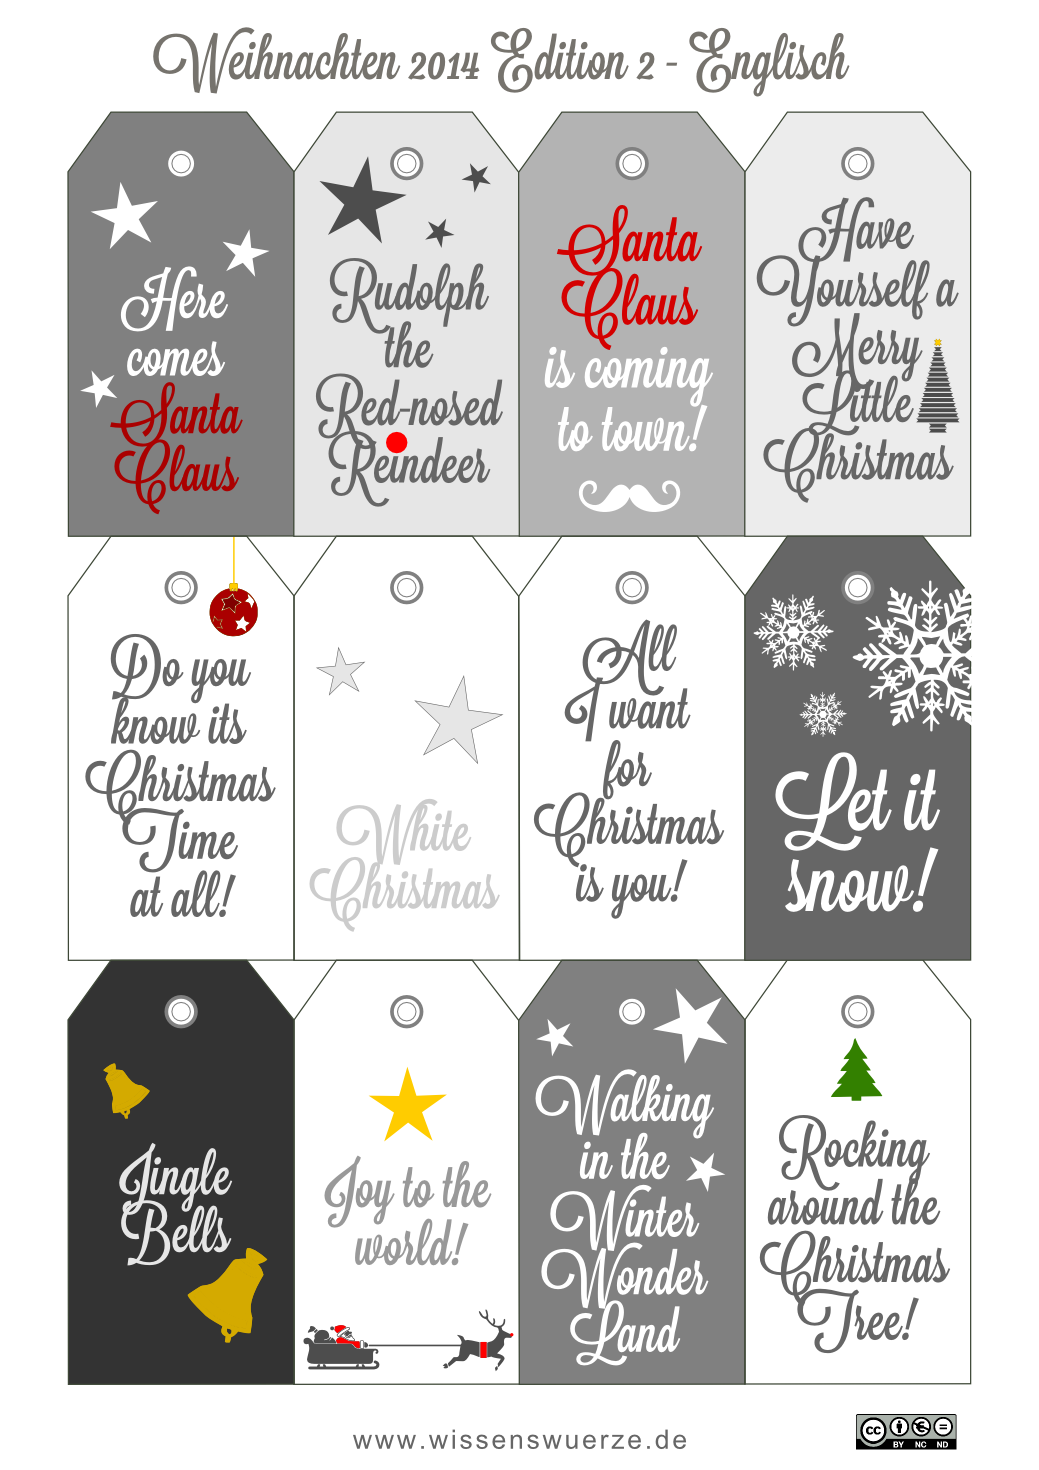 weihnachtsgeschenkanh nger edition 2 xmas weihnachten geschenkanh nger weihnachten und. Black Bedroom Furniture Sets. Home Design Ideas